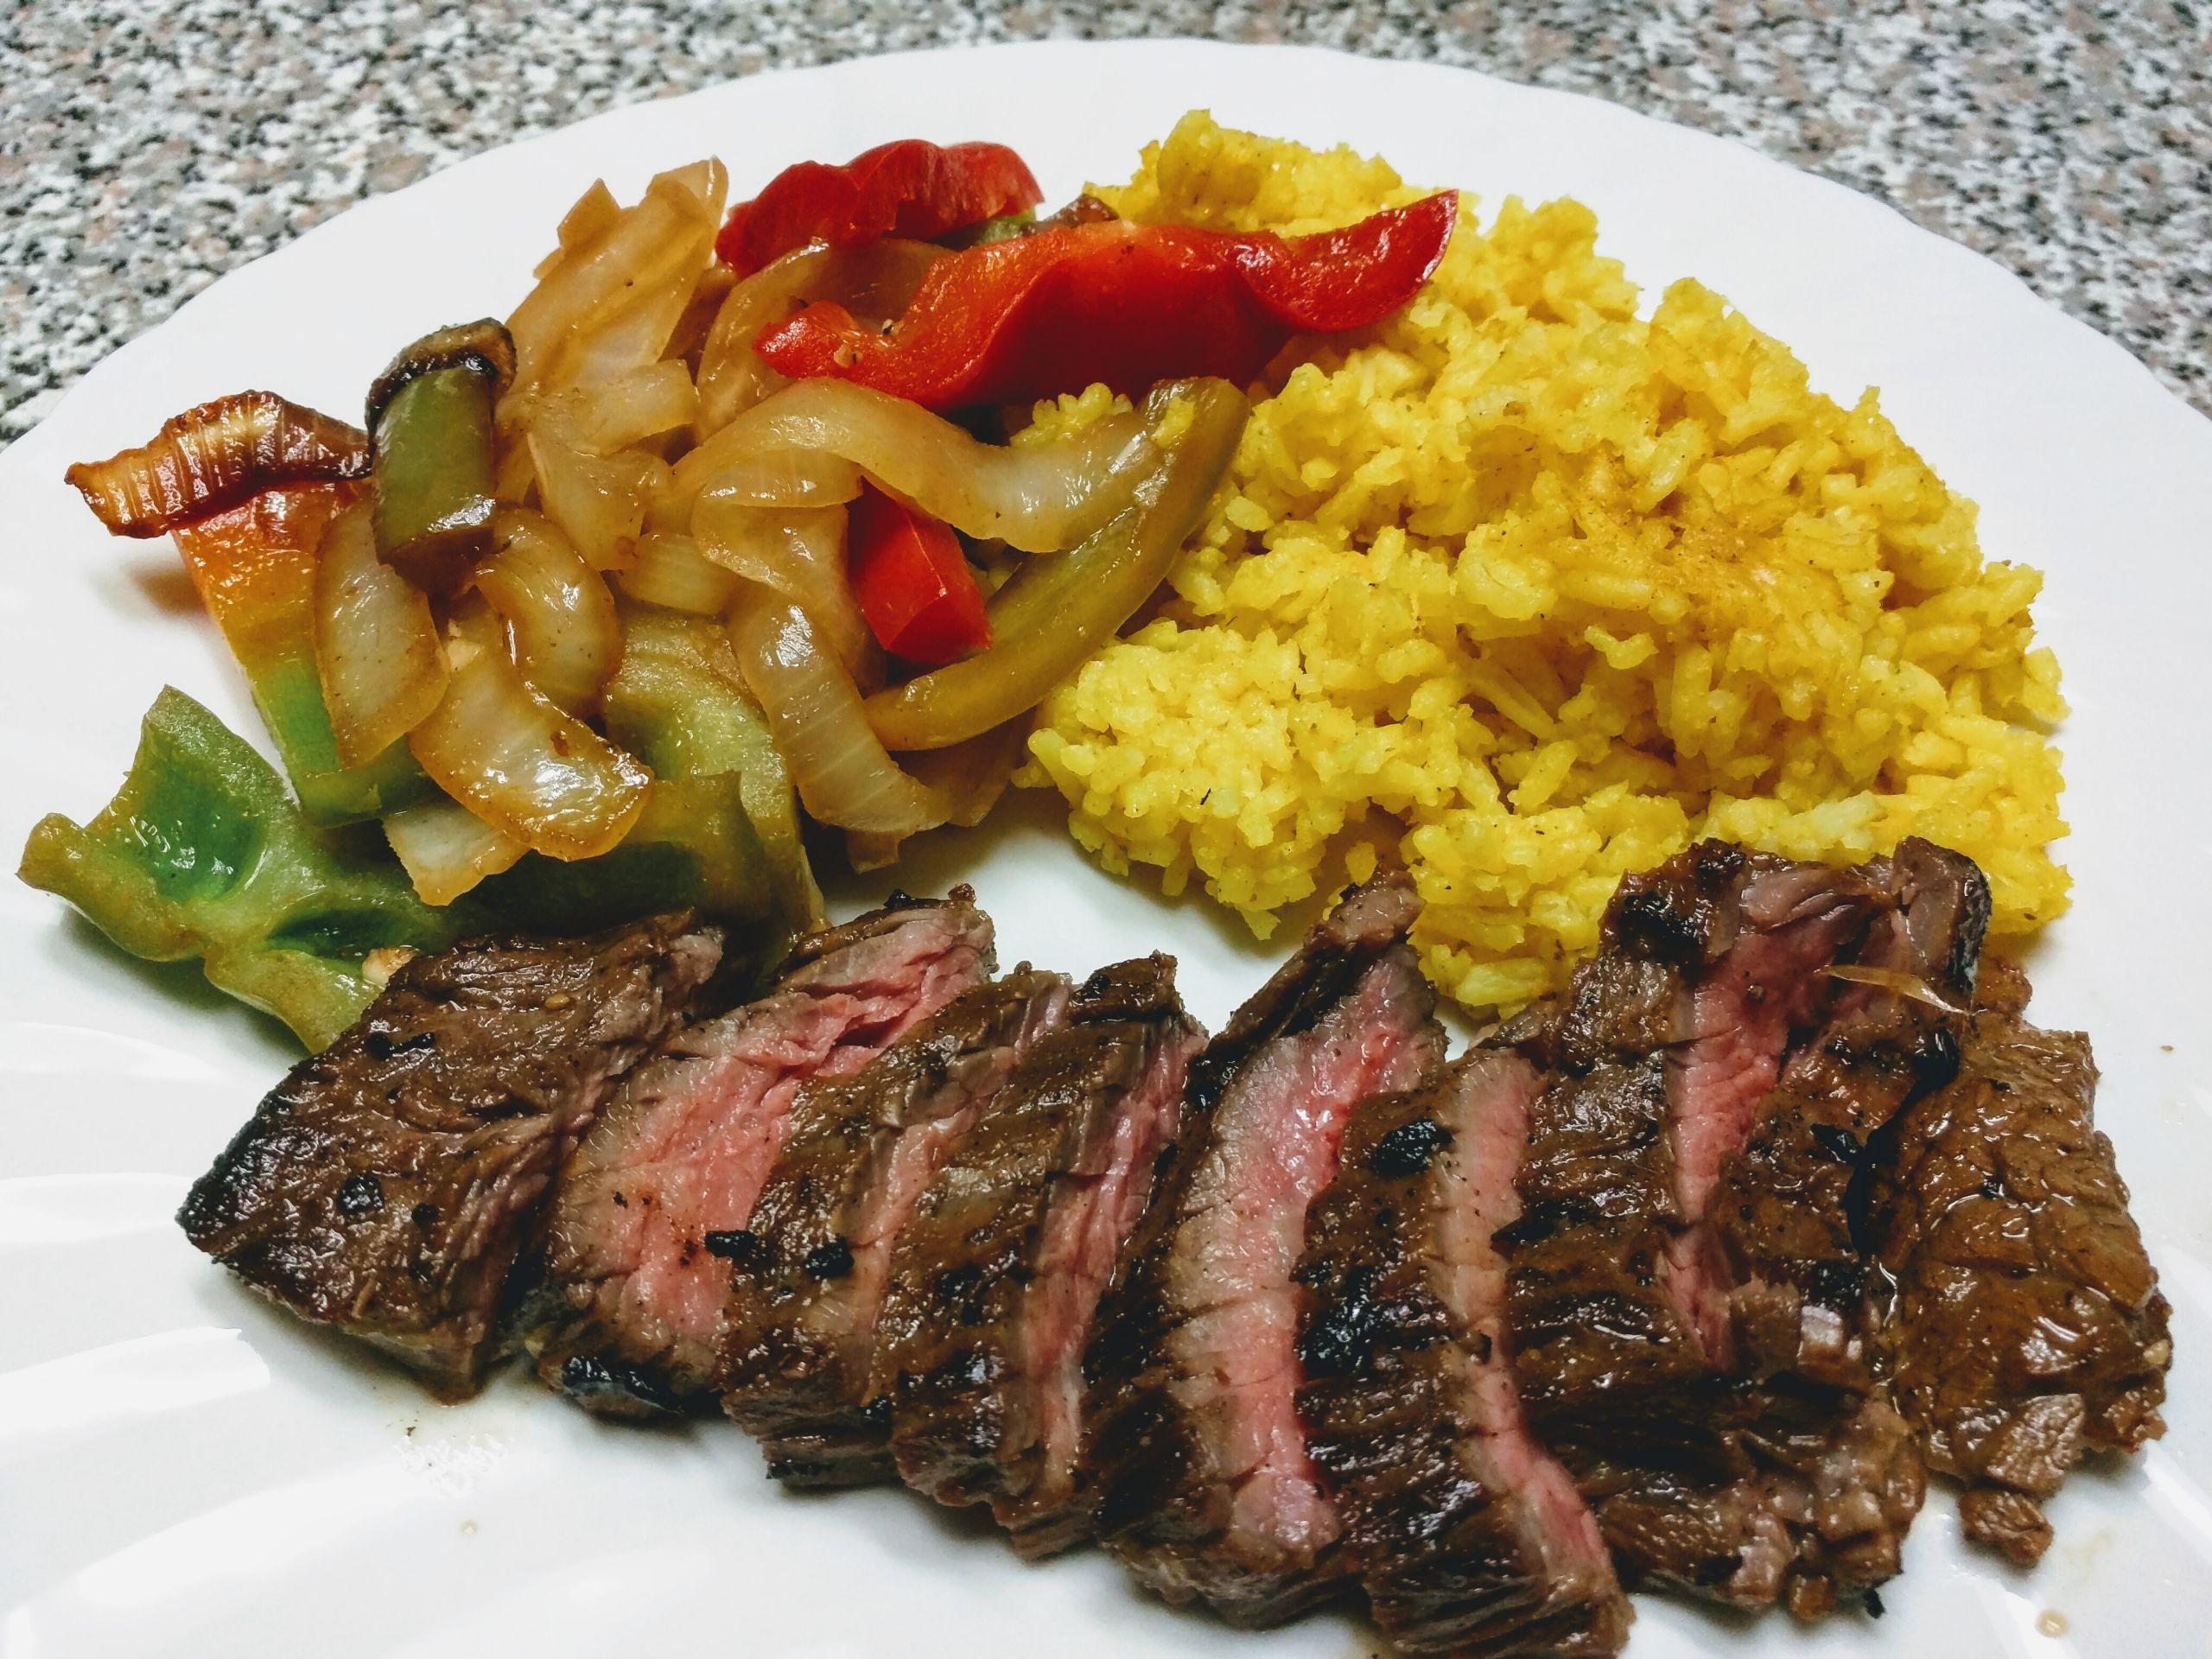 Sous Vide Skirt Steak Fajitas  The Best Ideas for sous Vide Skirt Steak Fajitas Best